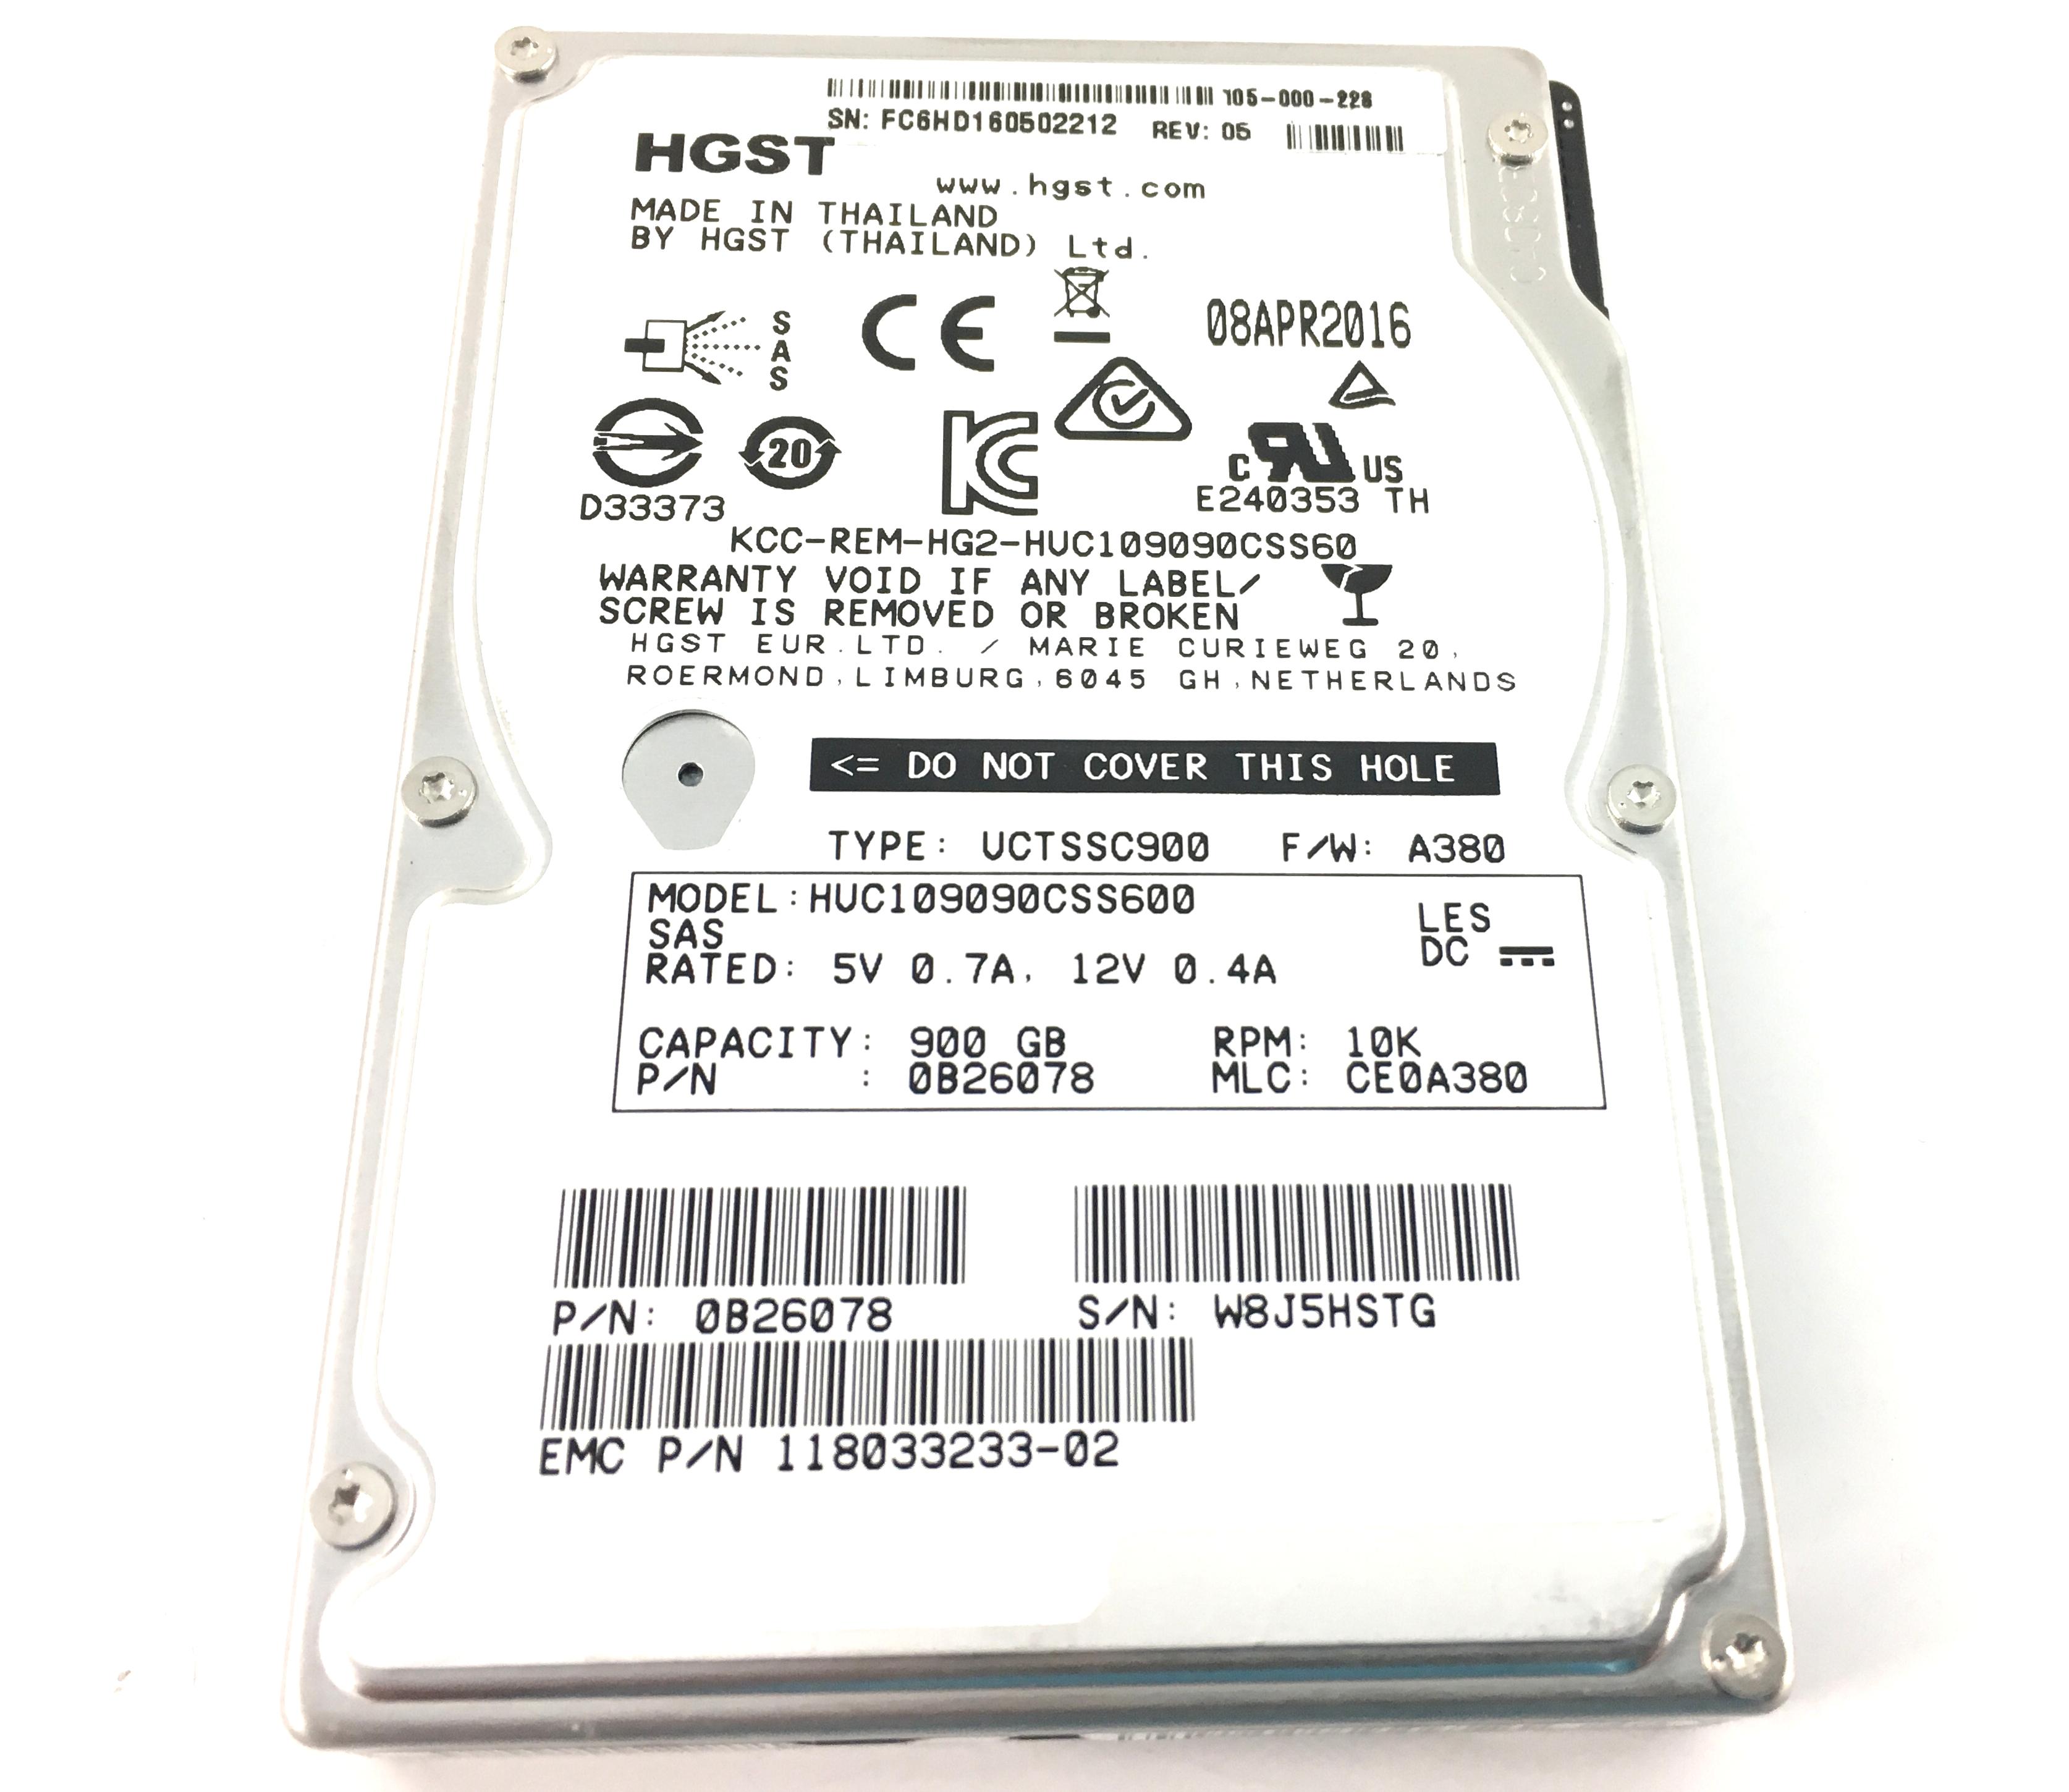 HGST 900GB 10K 6GBPS SAS 2.5'' HARD DRIVE (HUC109090CSS600)